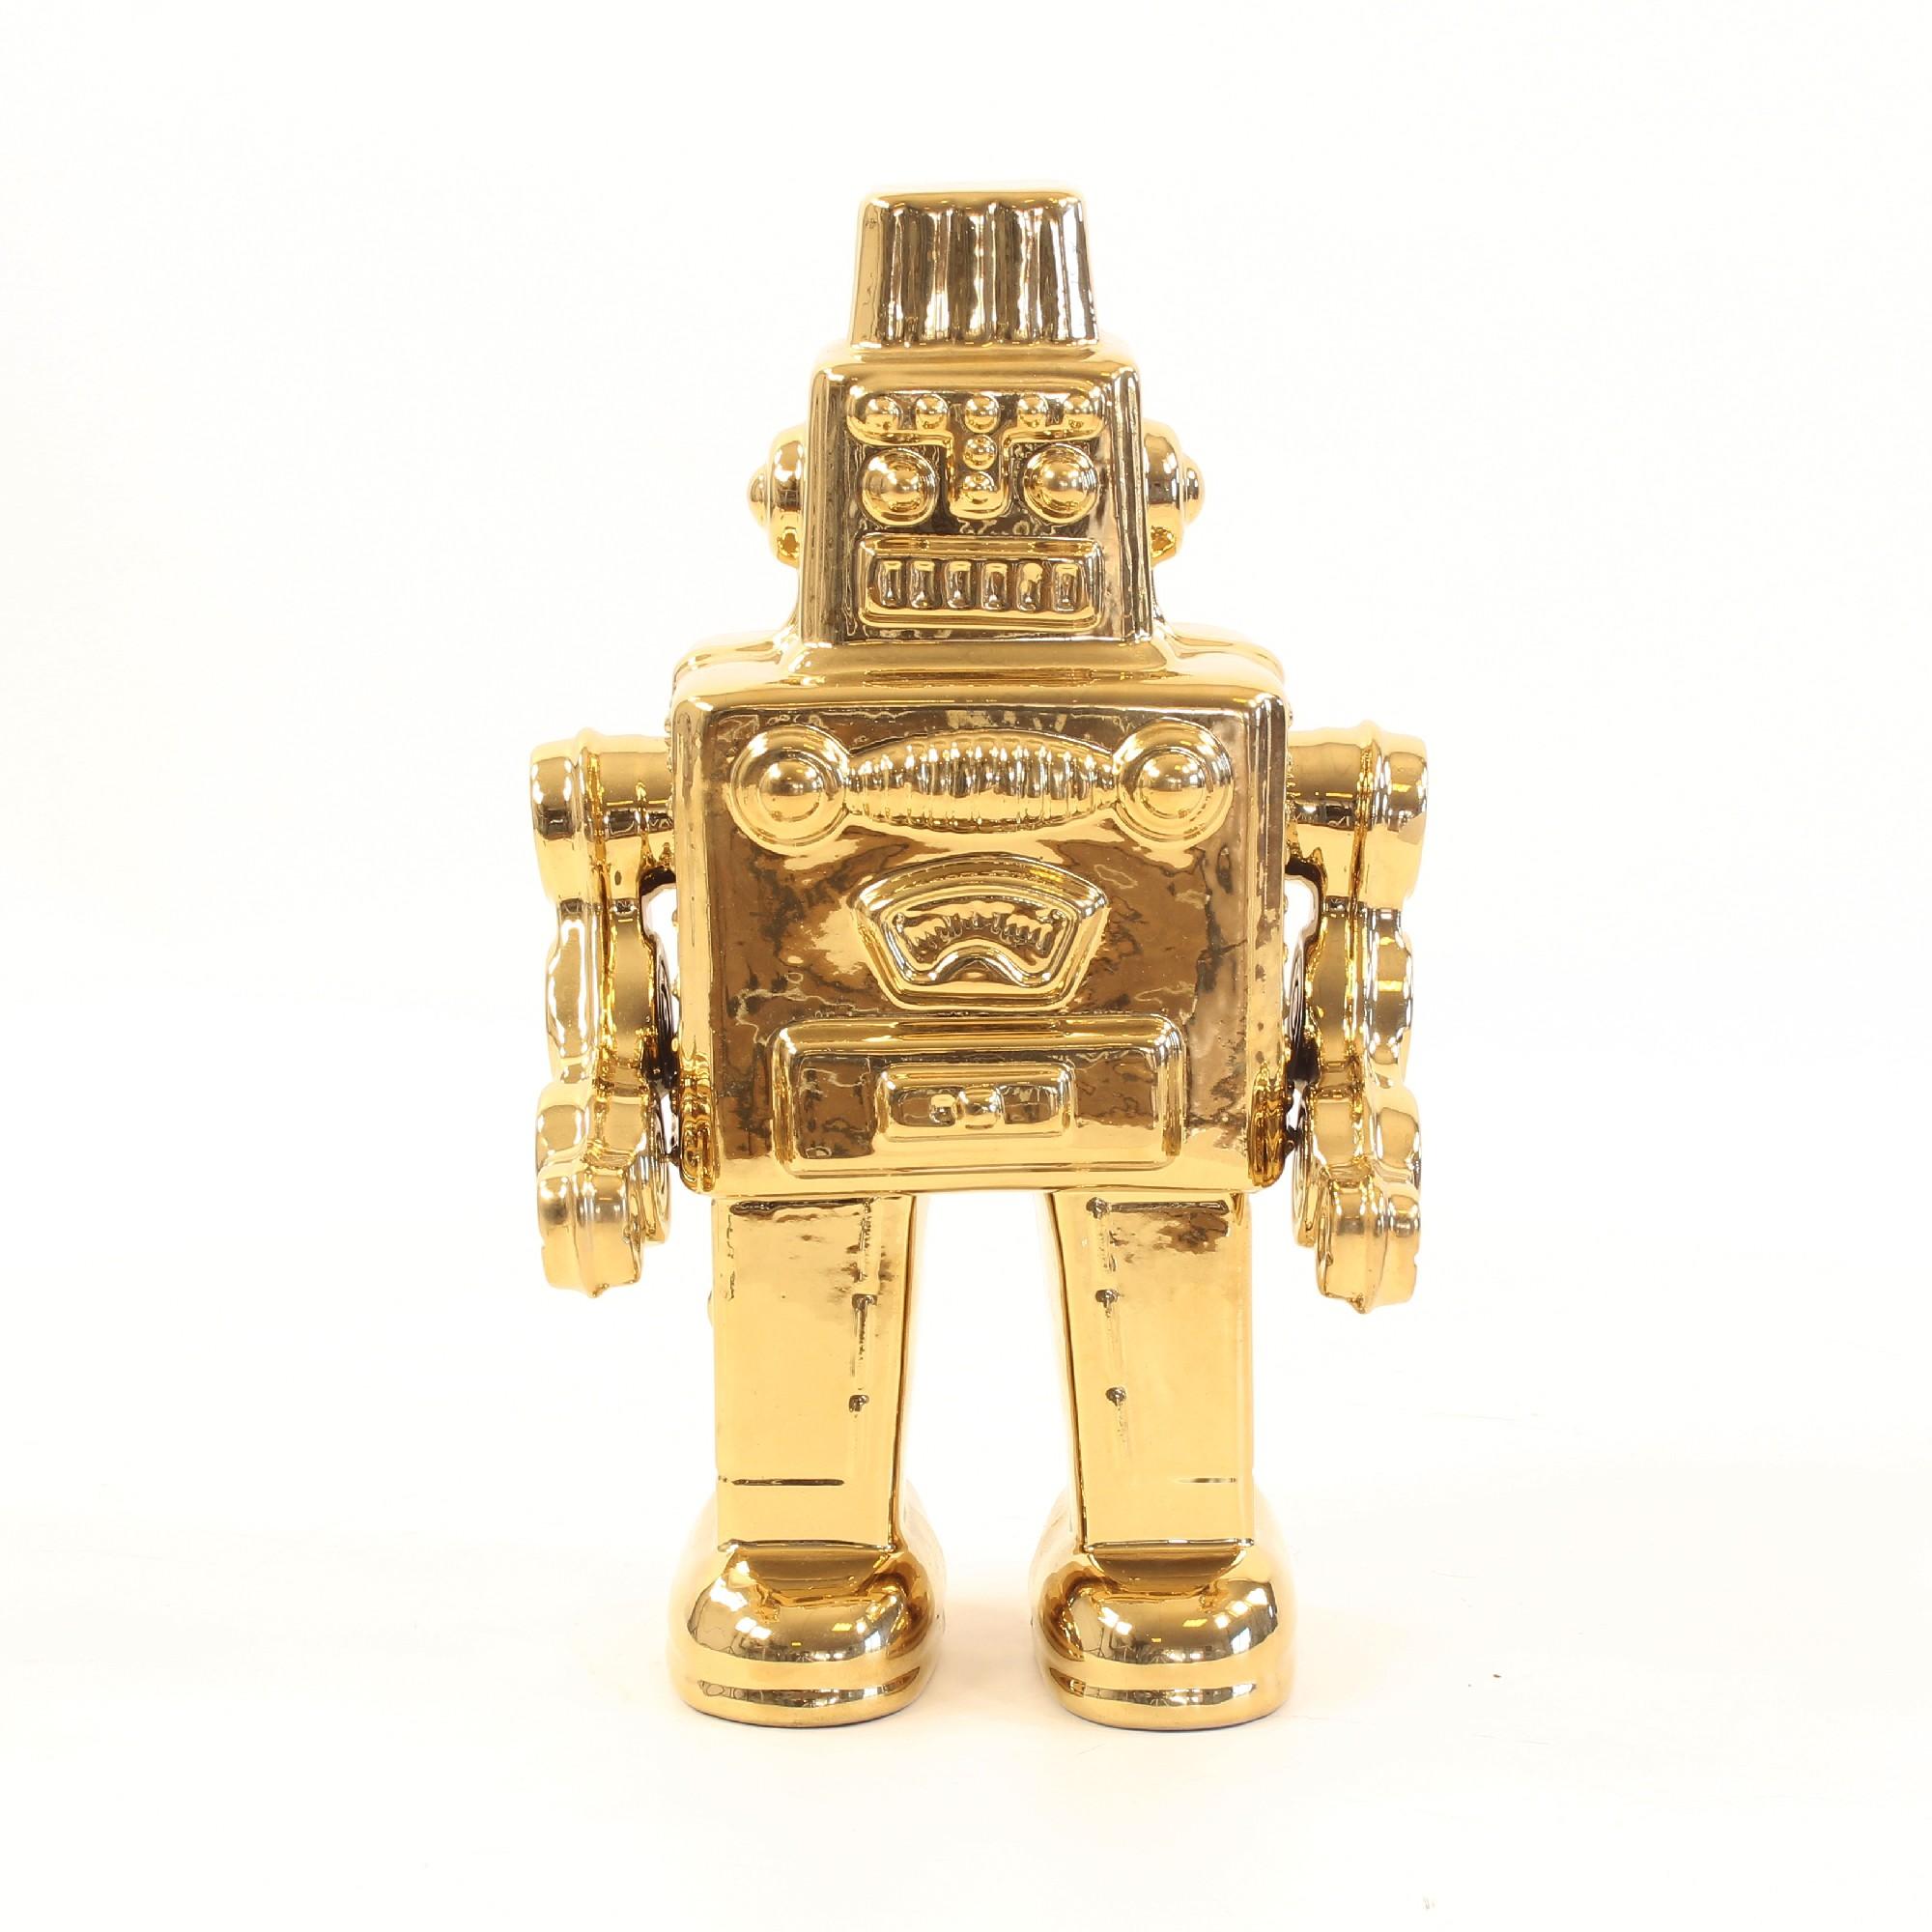 My Robot Robbi